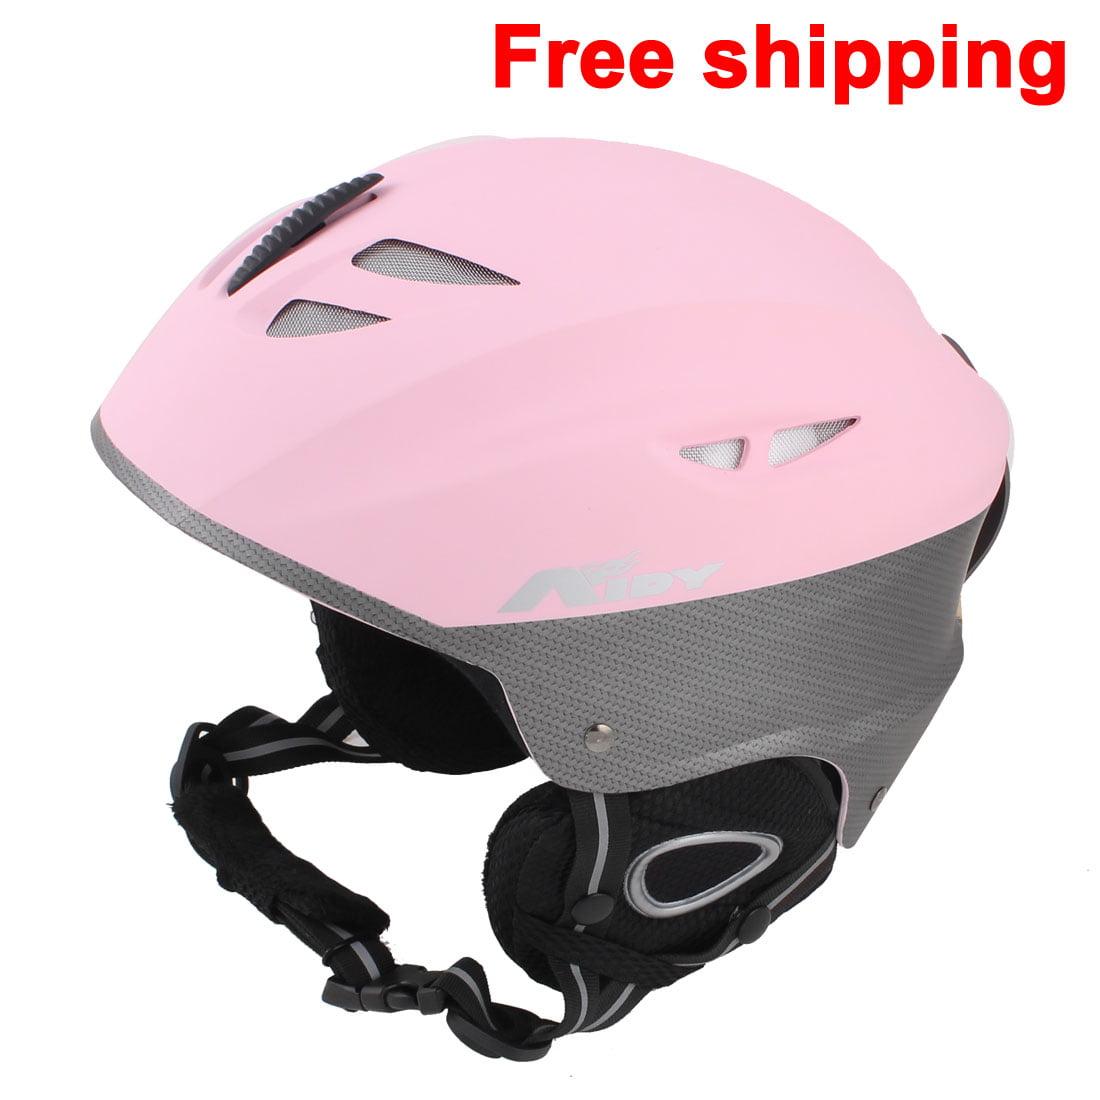 Women Men Skateboard Skiing Racing Bicycle Bike Sports Helmet Size L Matte Pink by